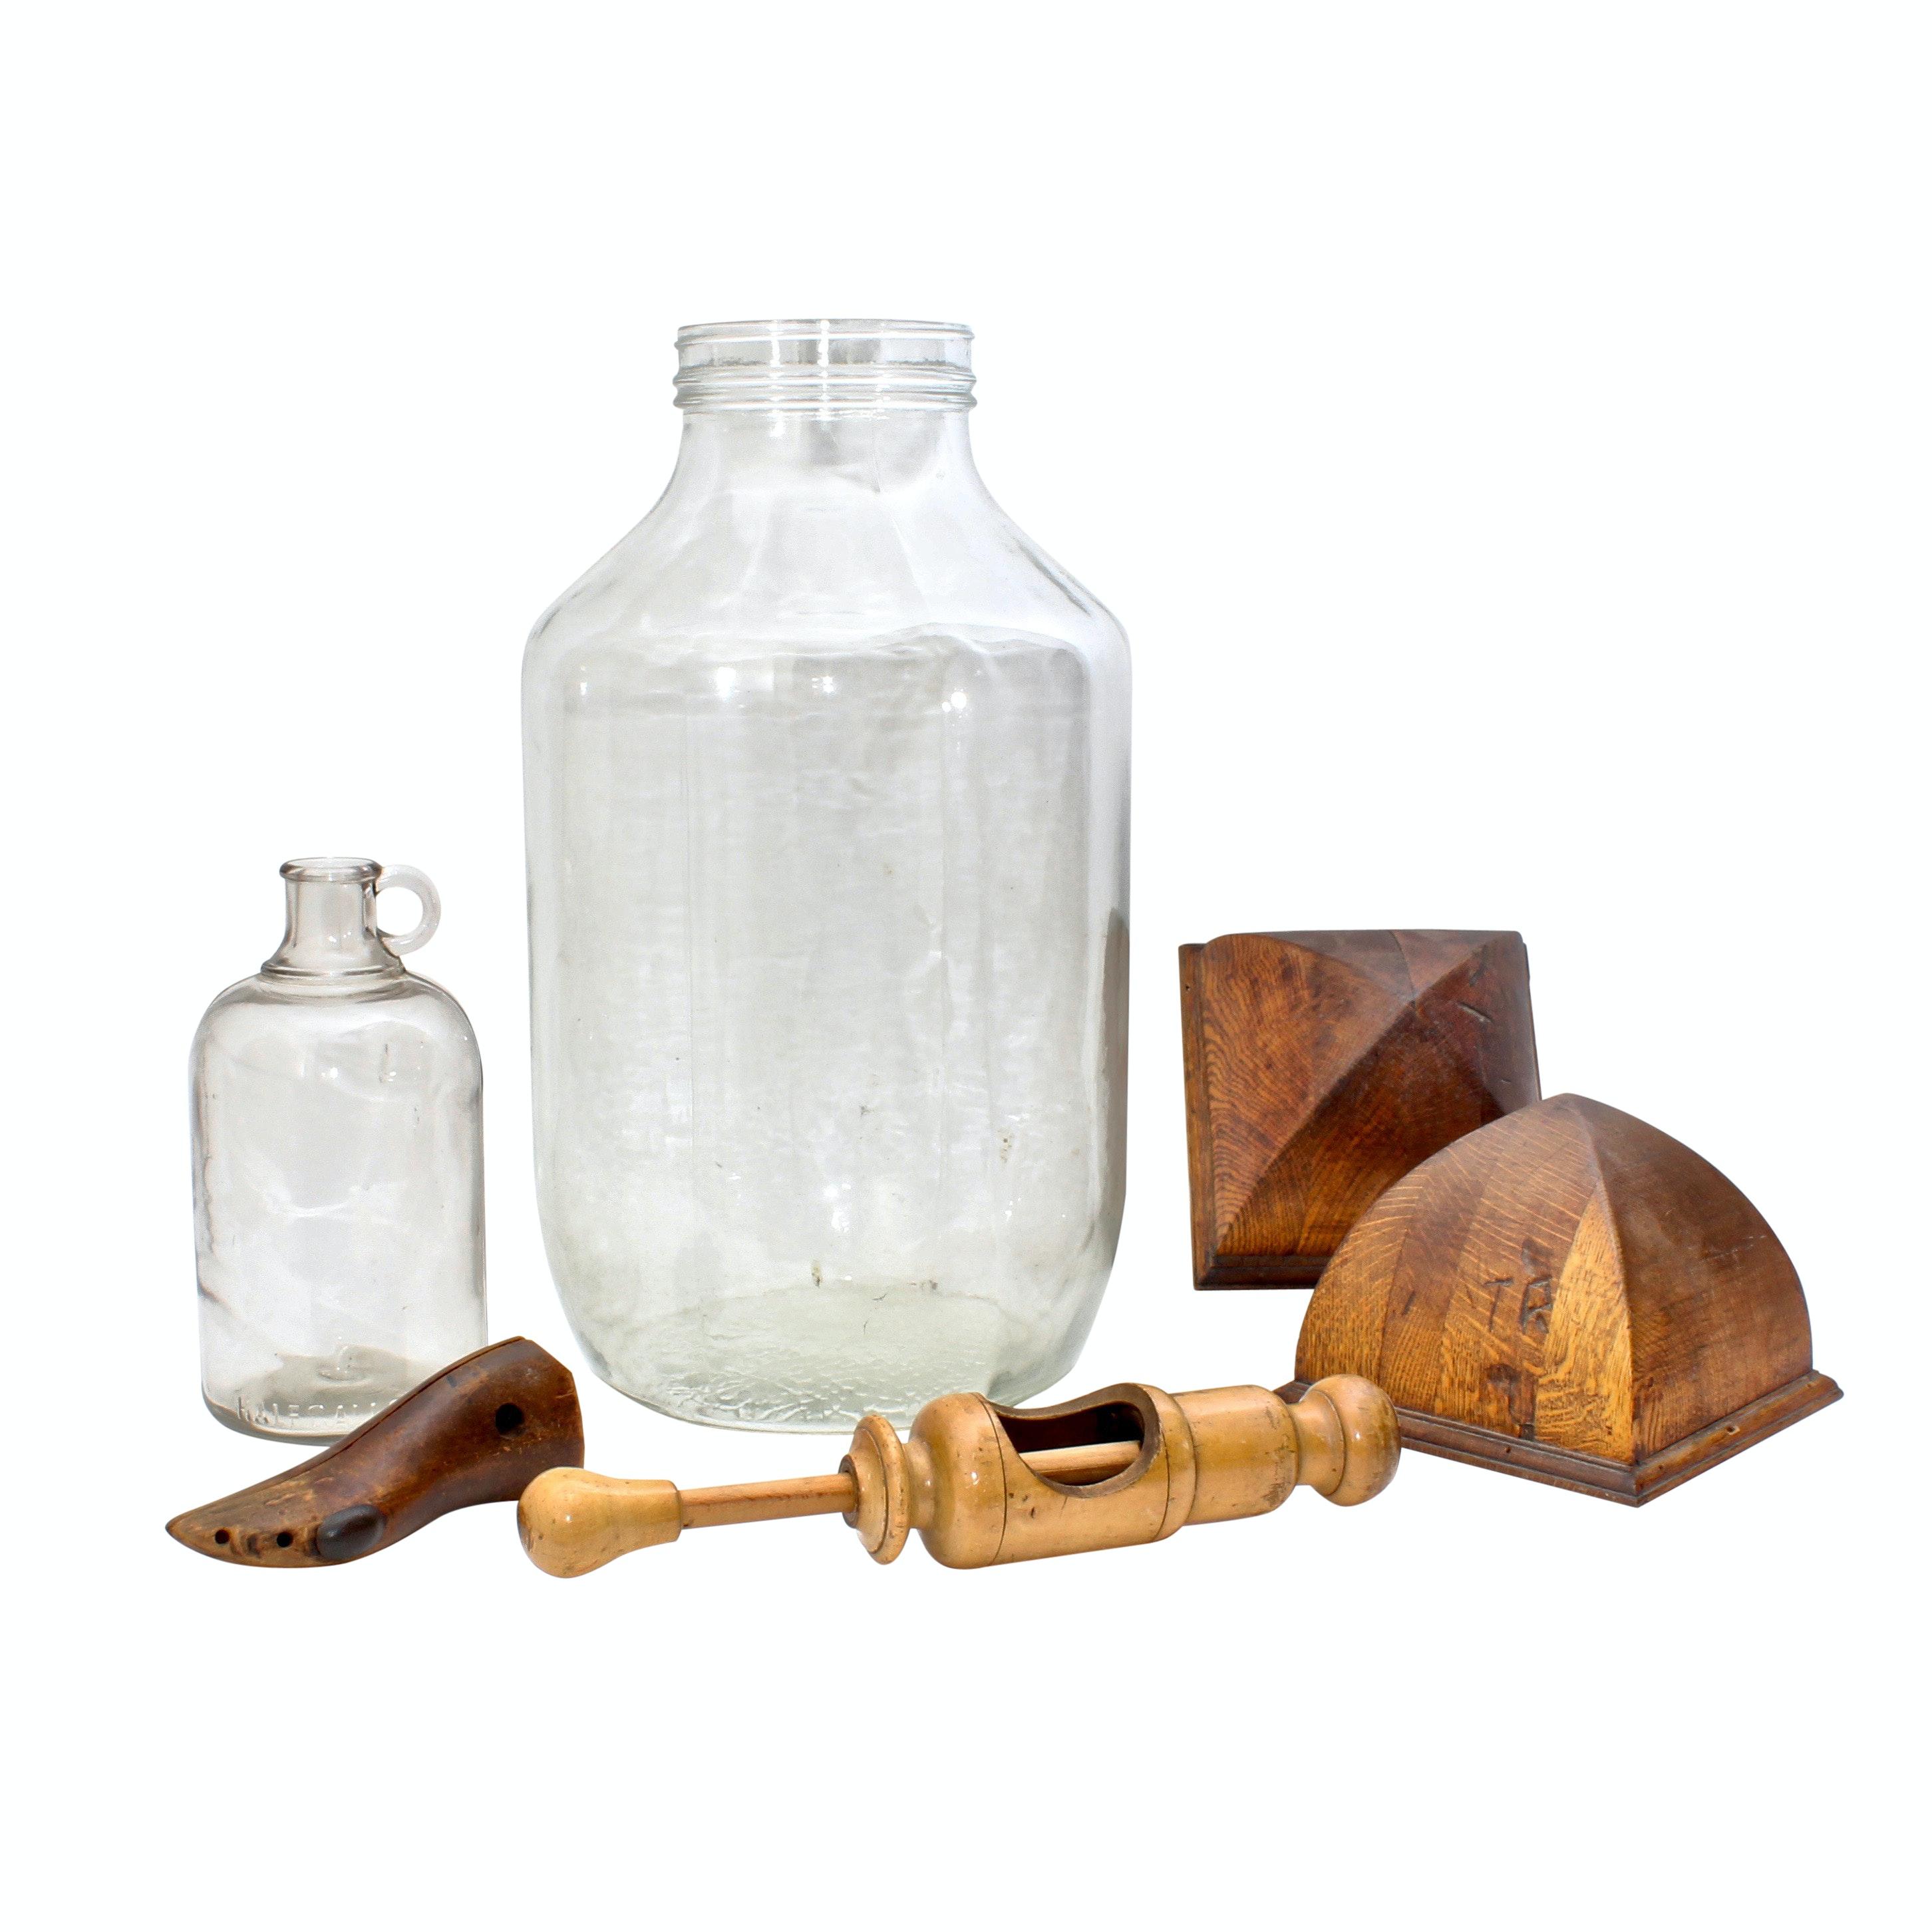 Two Vintage Glass Jugs and Kitchenalia